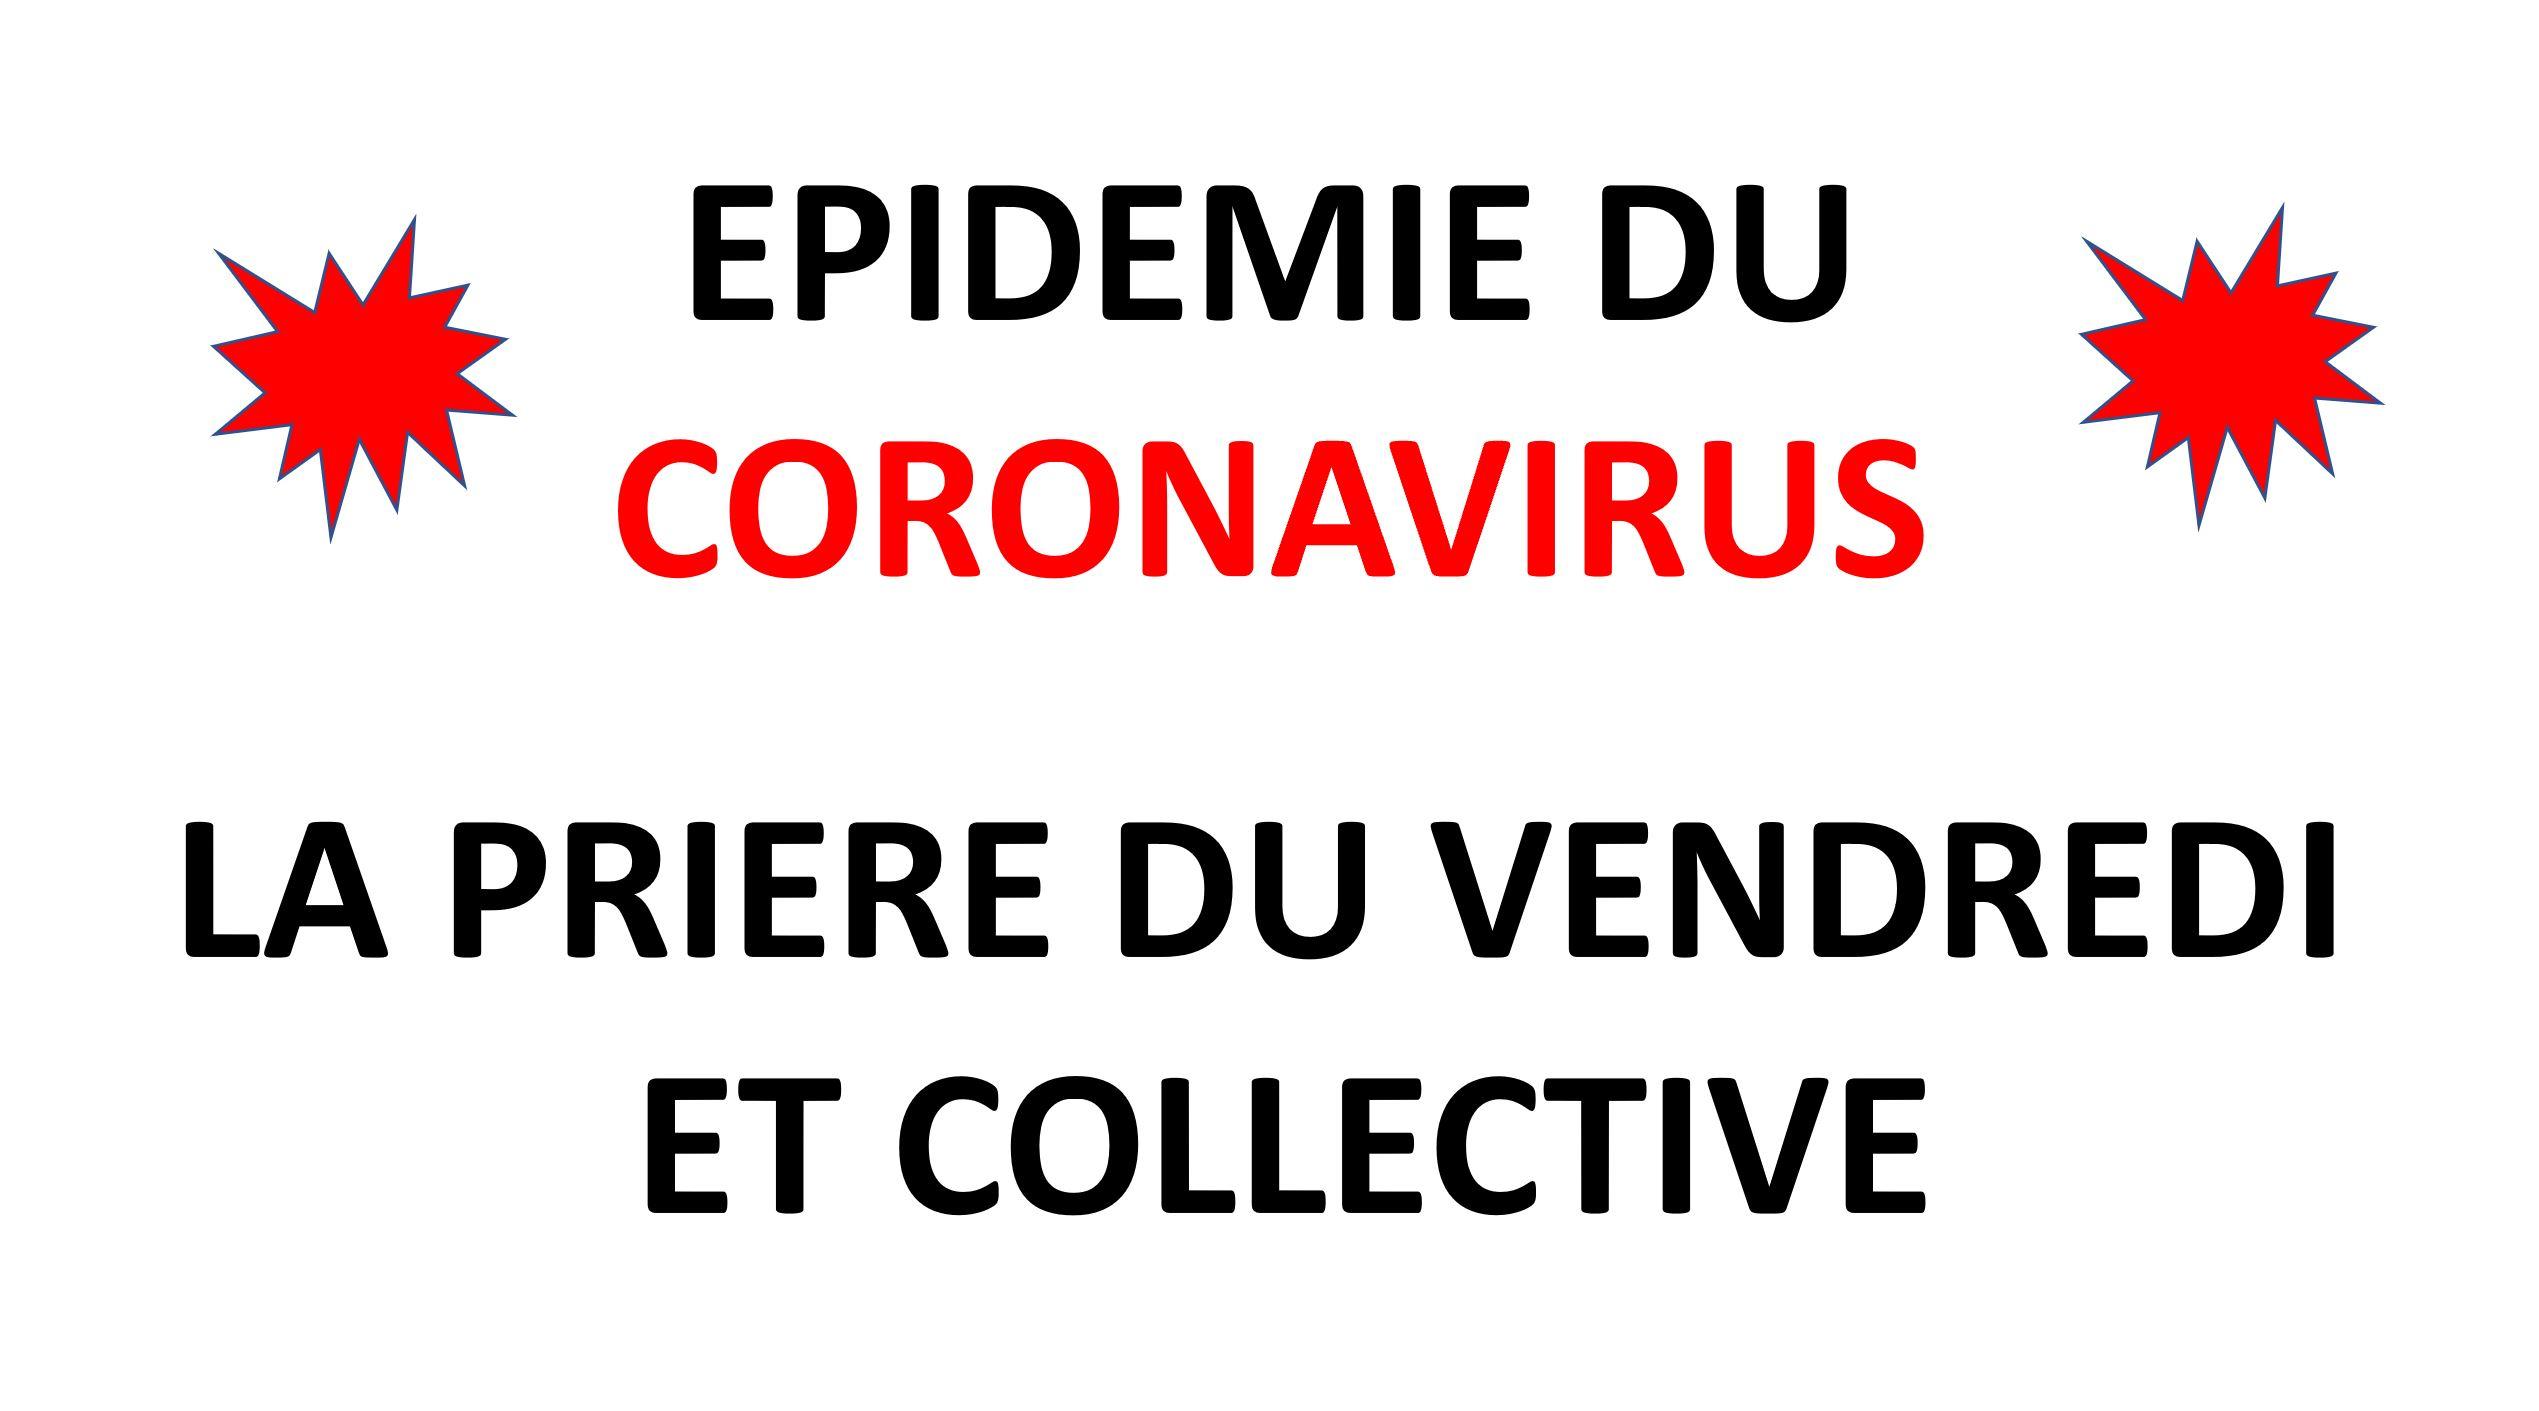 Epidemie du coronavirus et priere du vendredi